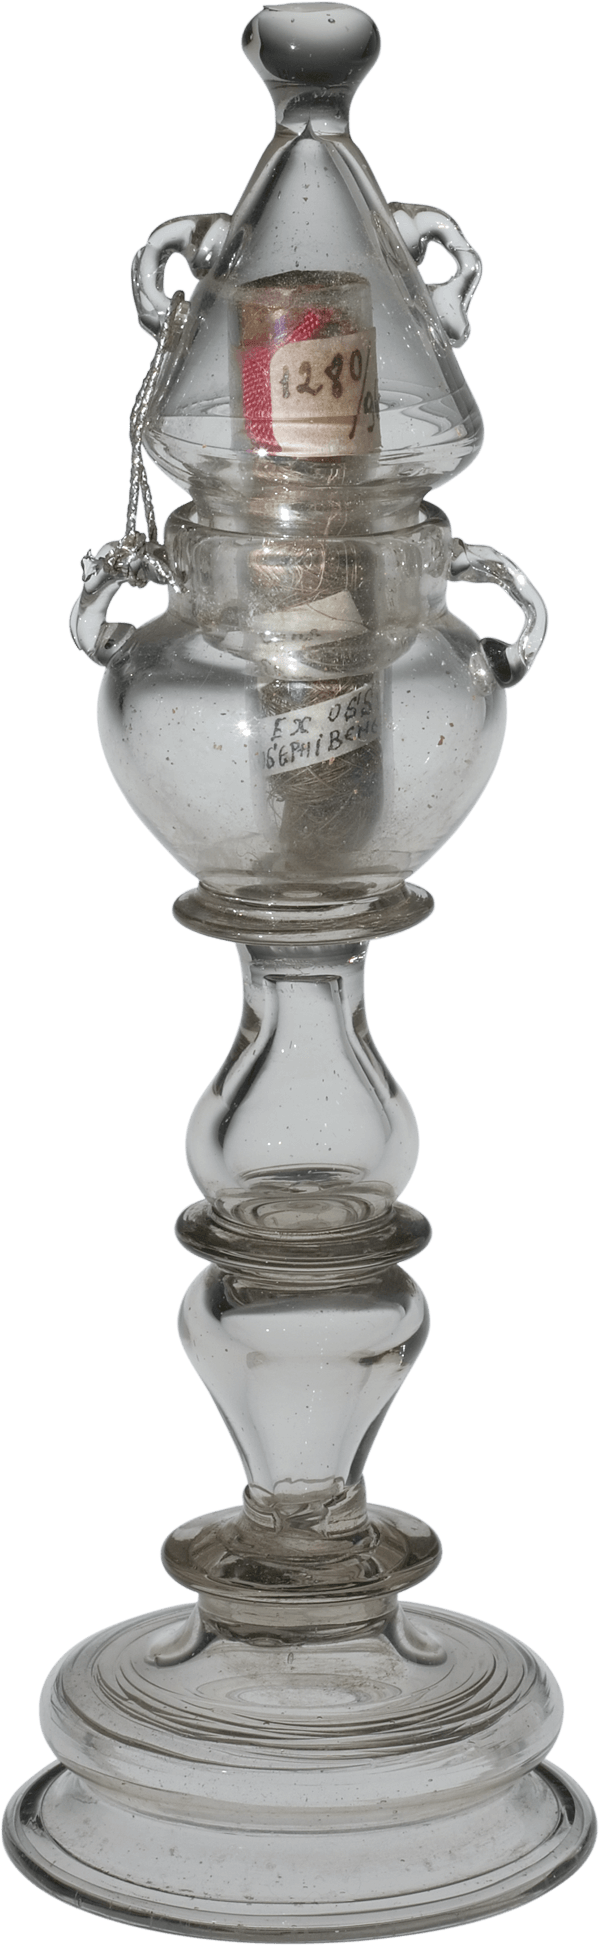 Reliquart Goblet. Colorless